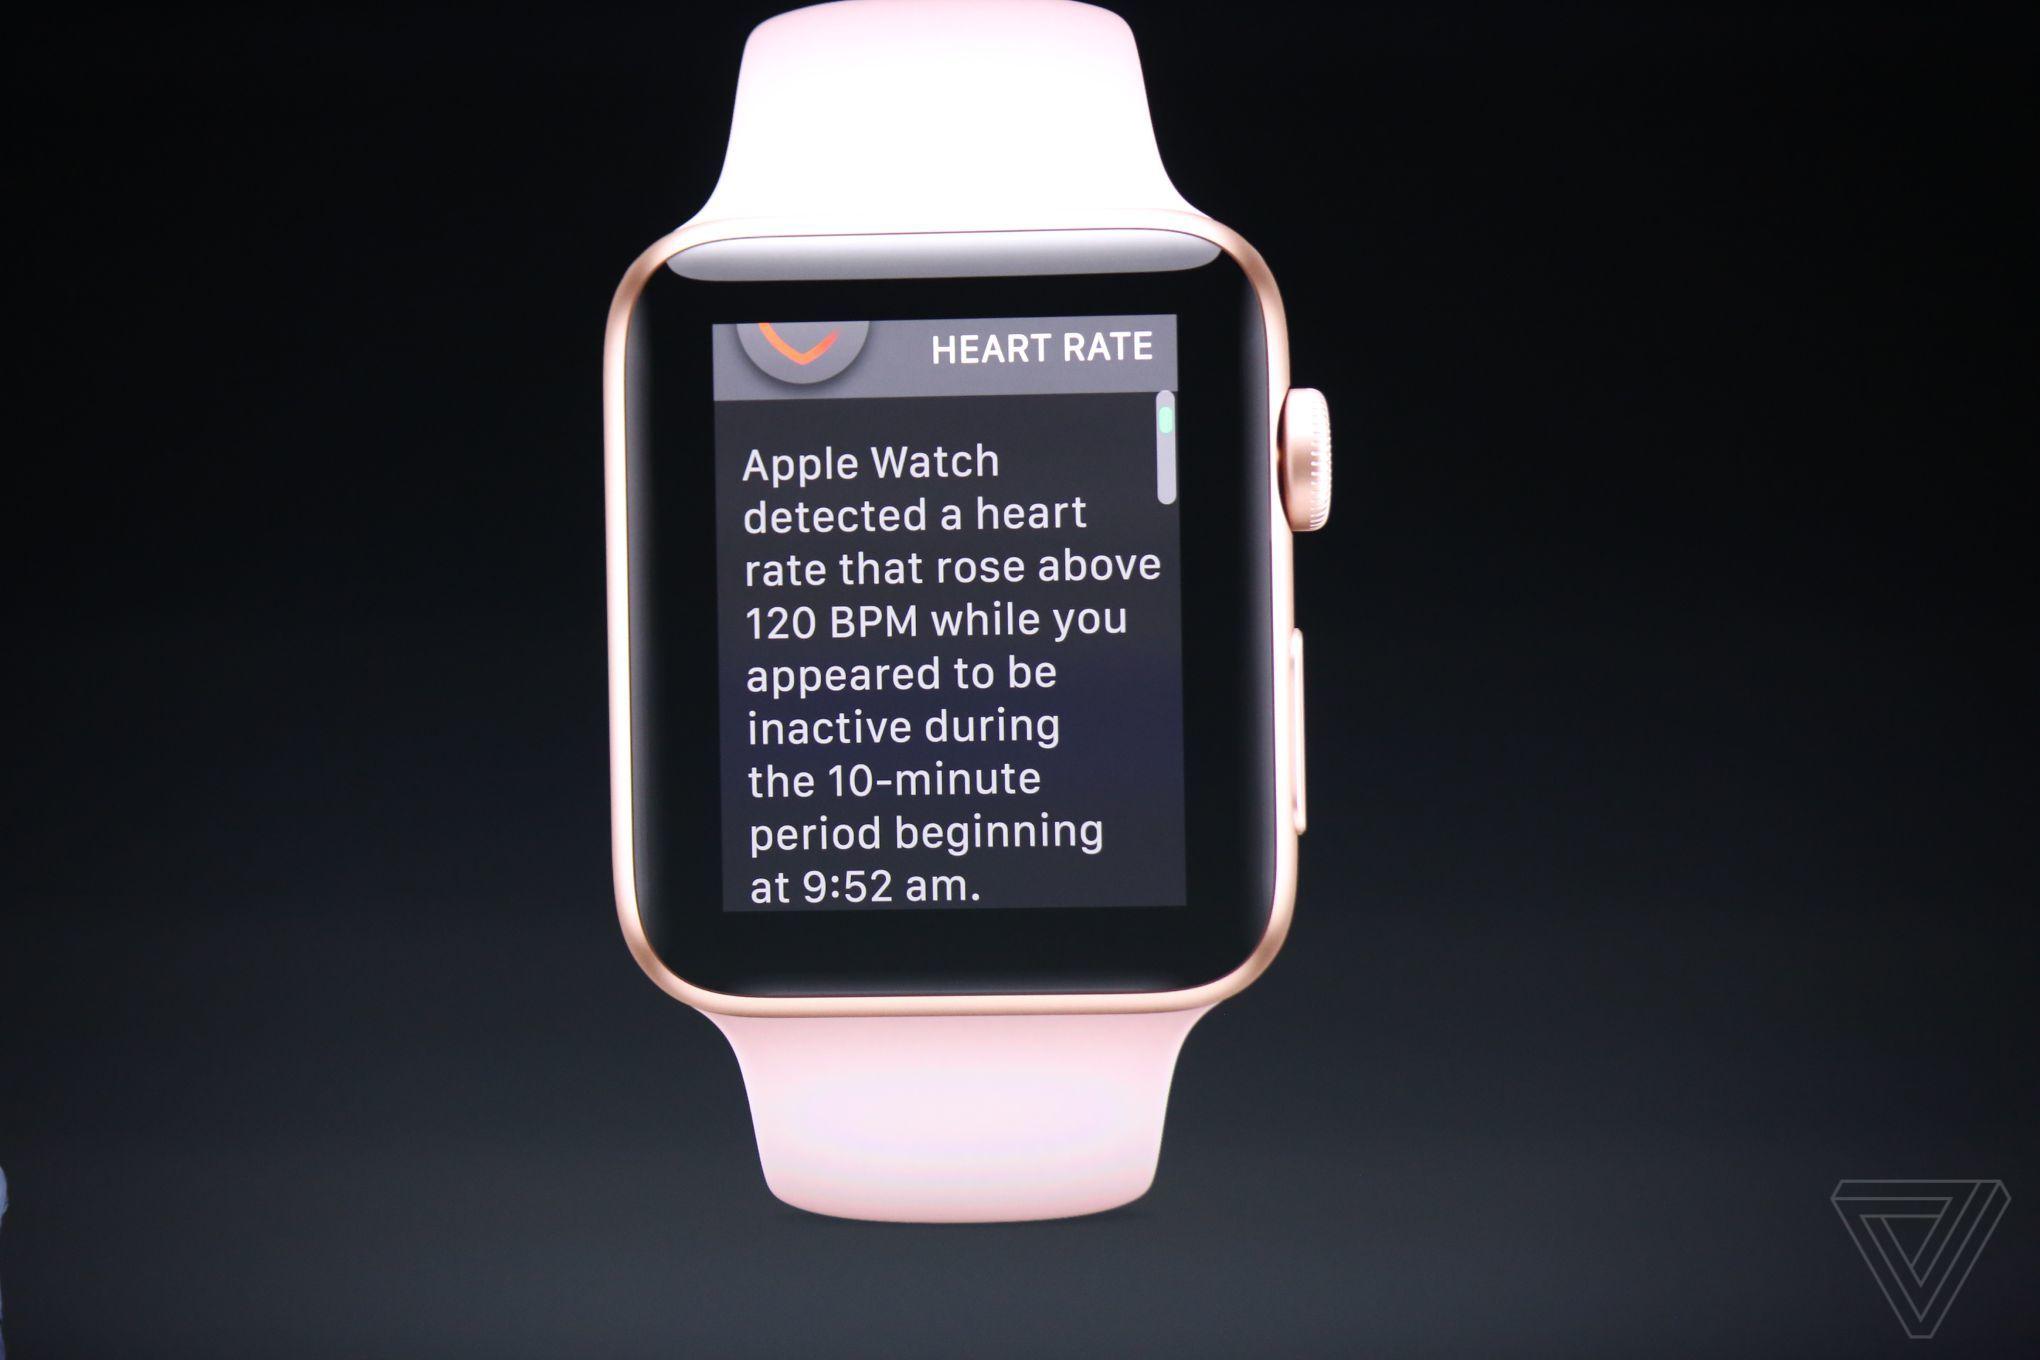 Apple Watch 6 New Apple Watch 3 Series